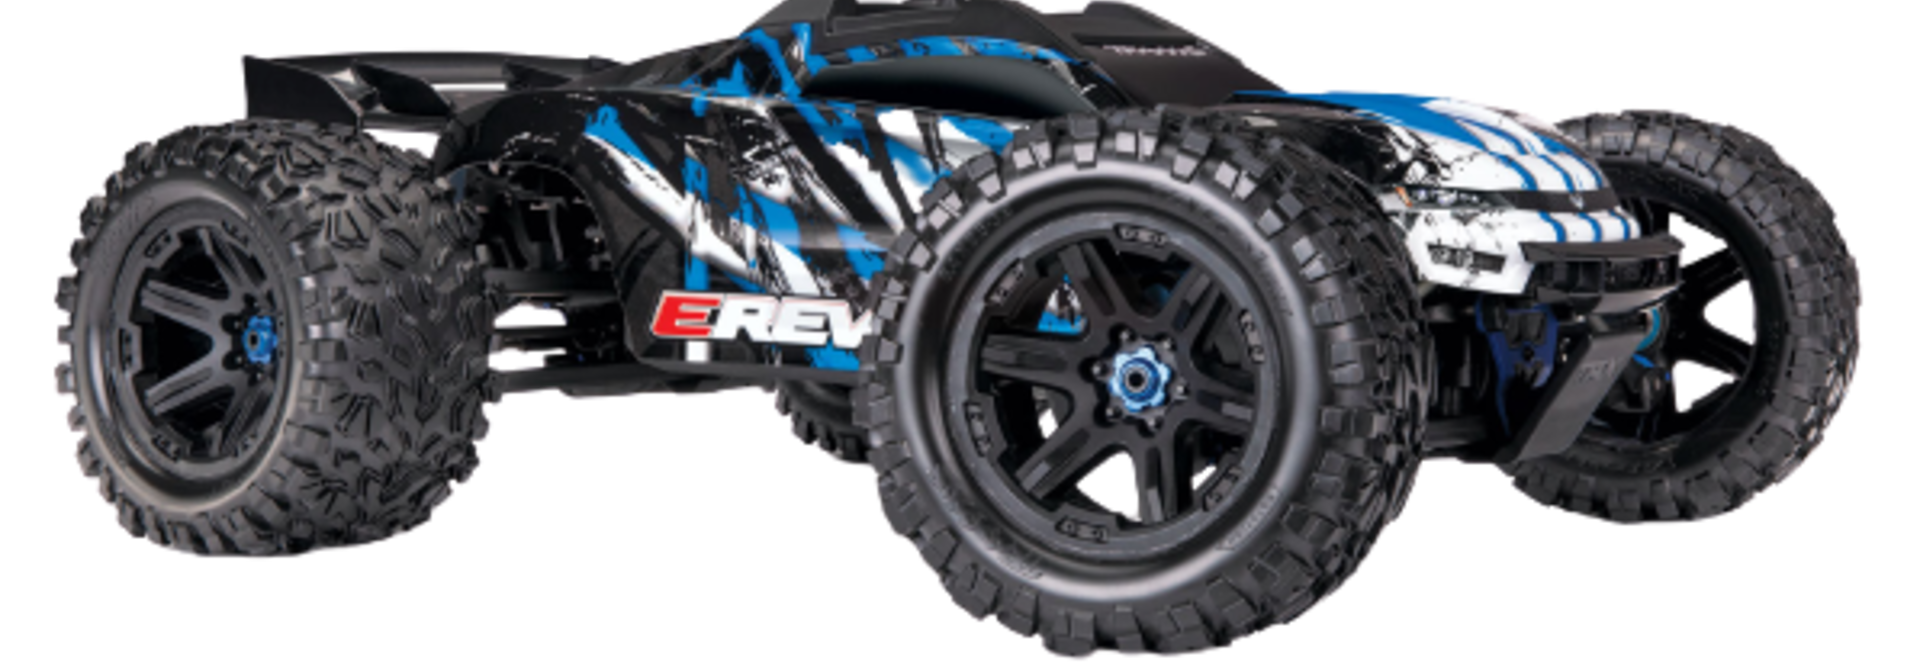 Traxxas E-Revo 2 TQi VXL-6S (no battery/charger), Blue TRX86086-4B